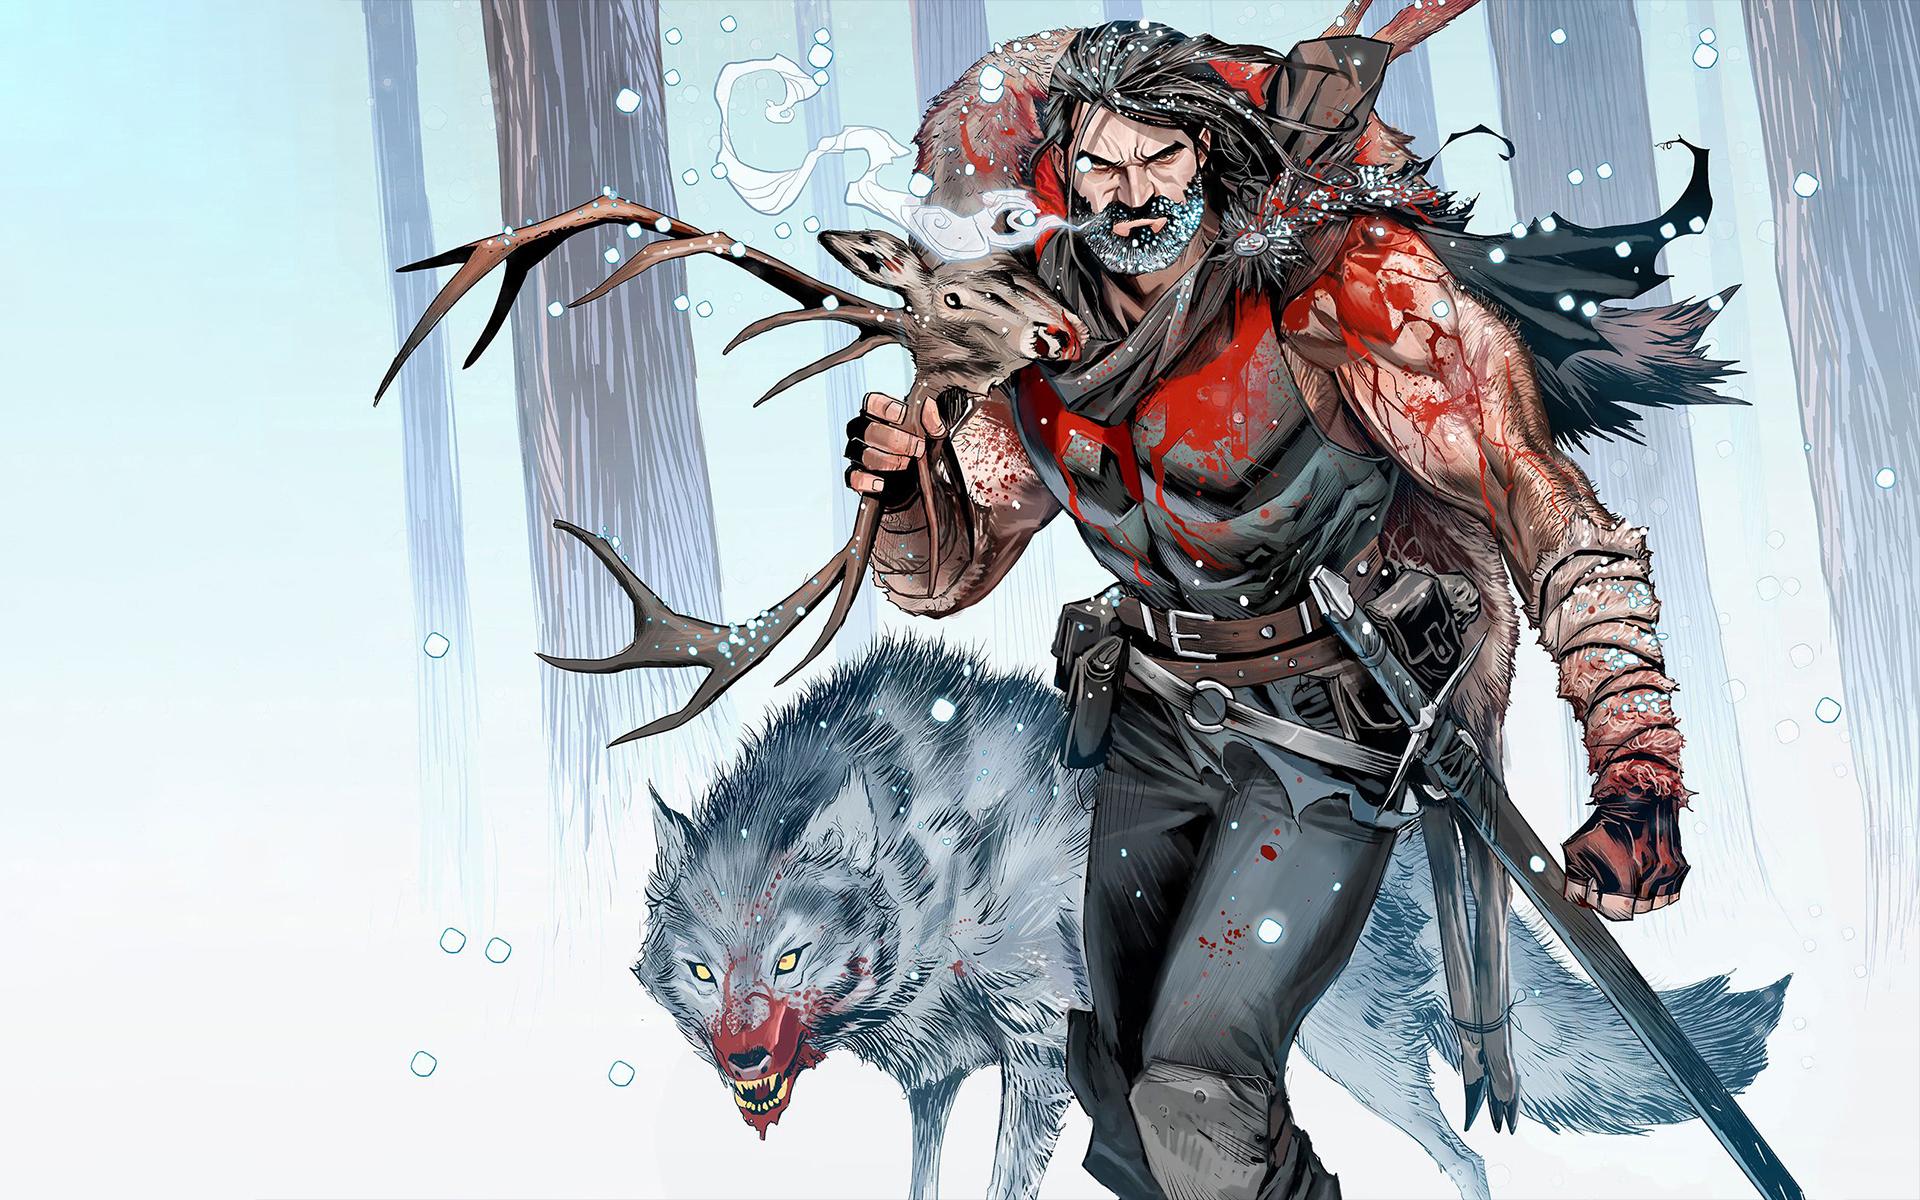 General 1920x1200 Santa Claus Grant Morrison Vikings comic books Christmas Norse mythology